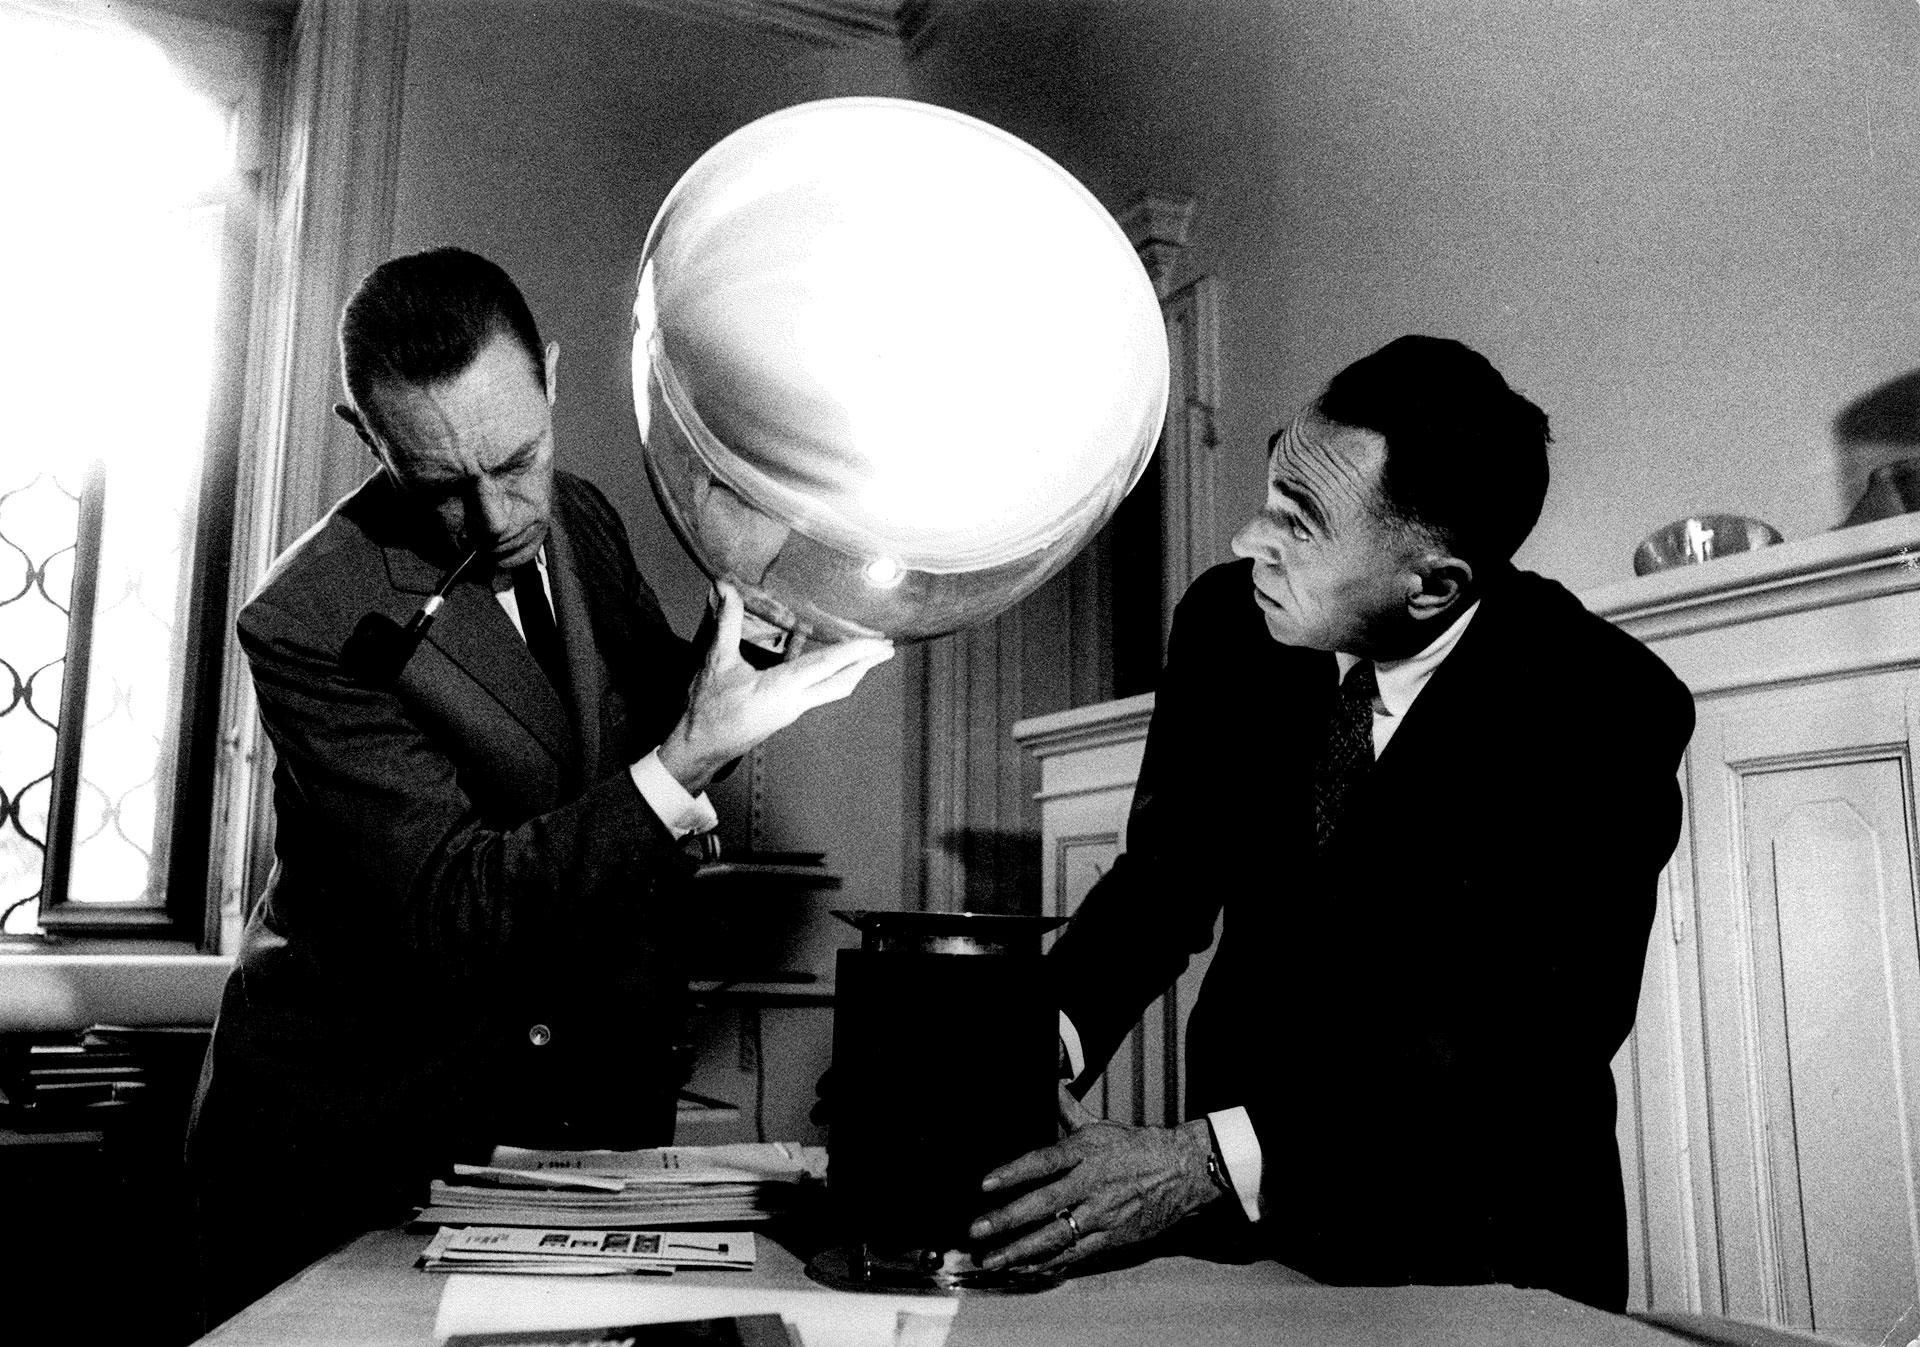 Achille a Pier Giacomo Castiglioni testují svítidlo Taccia. © Ugo Mulas